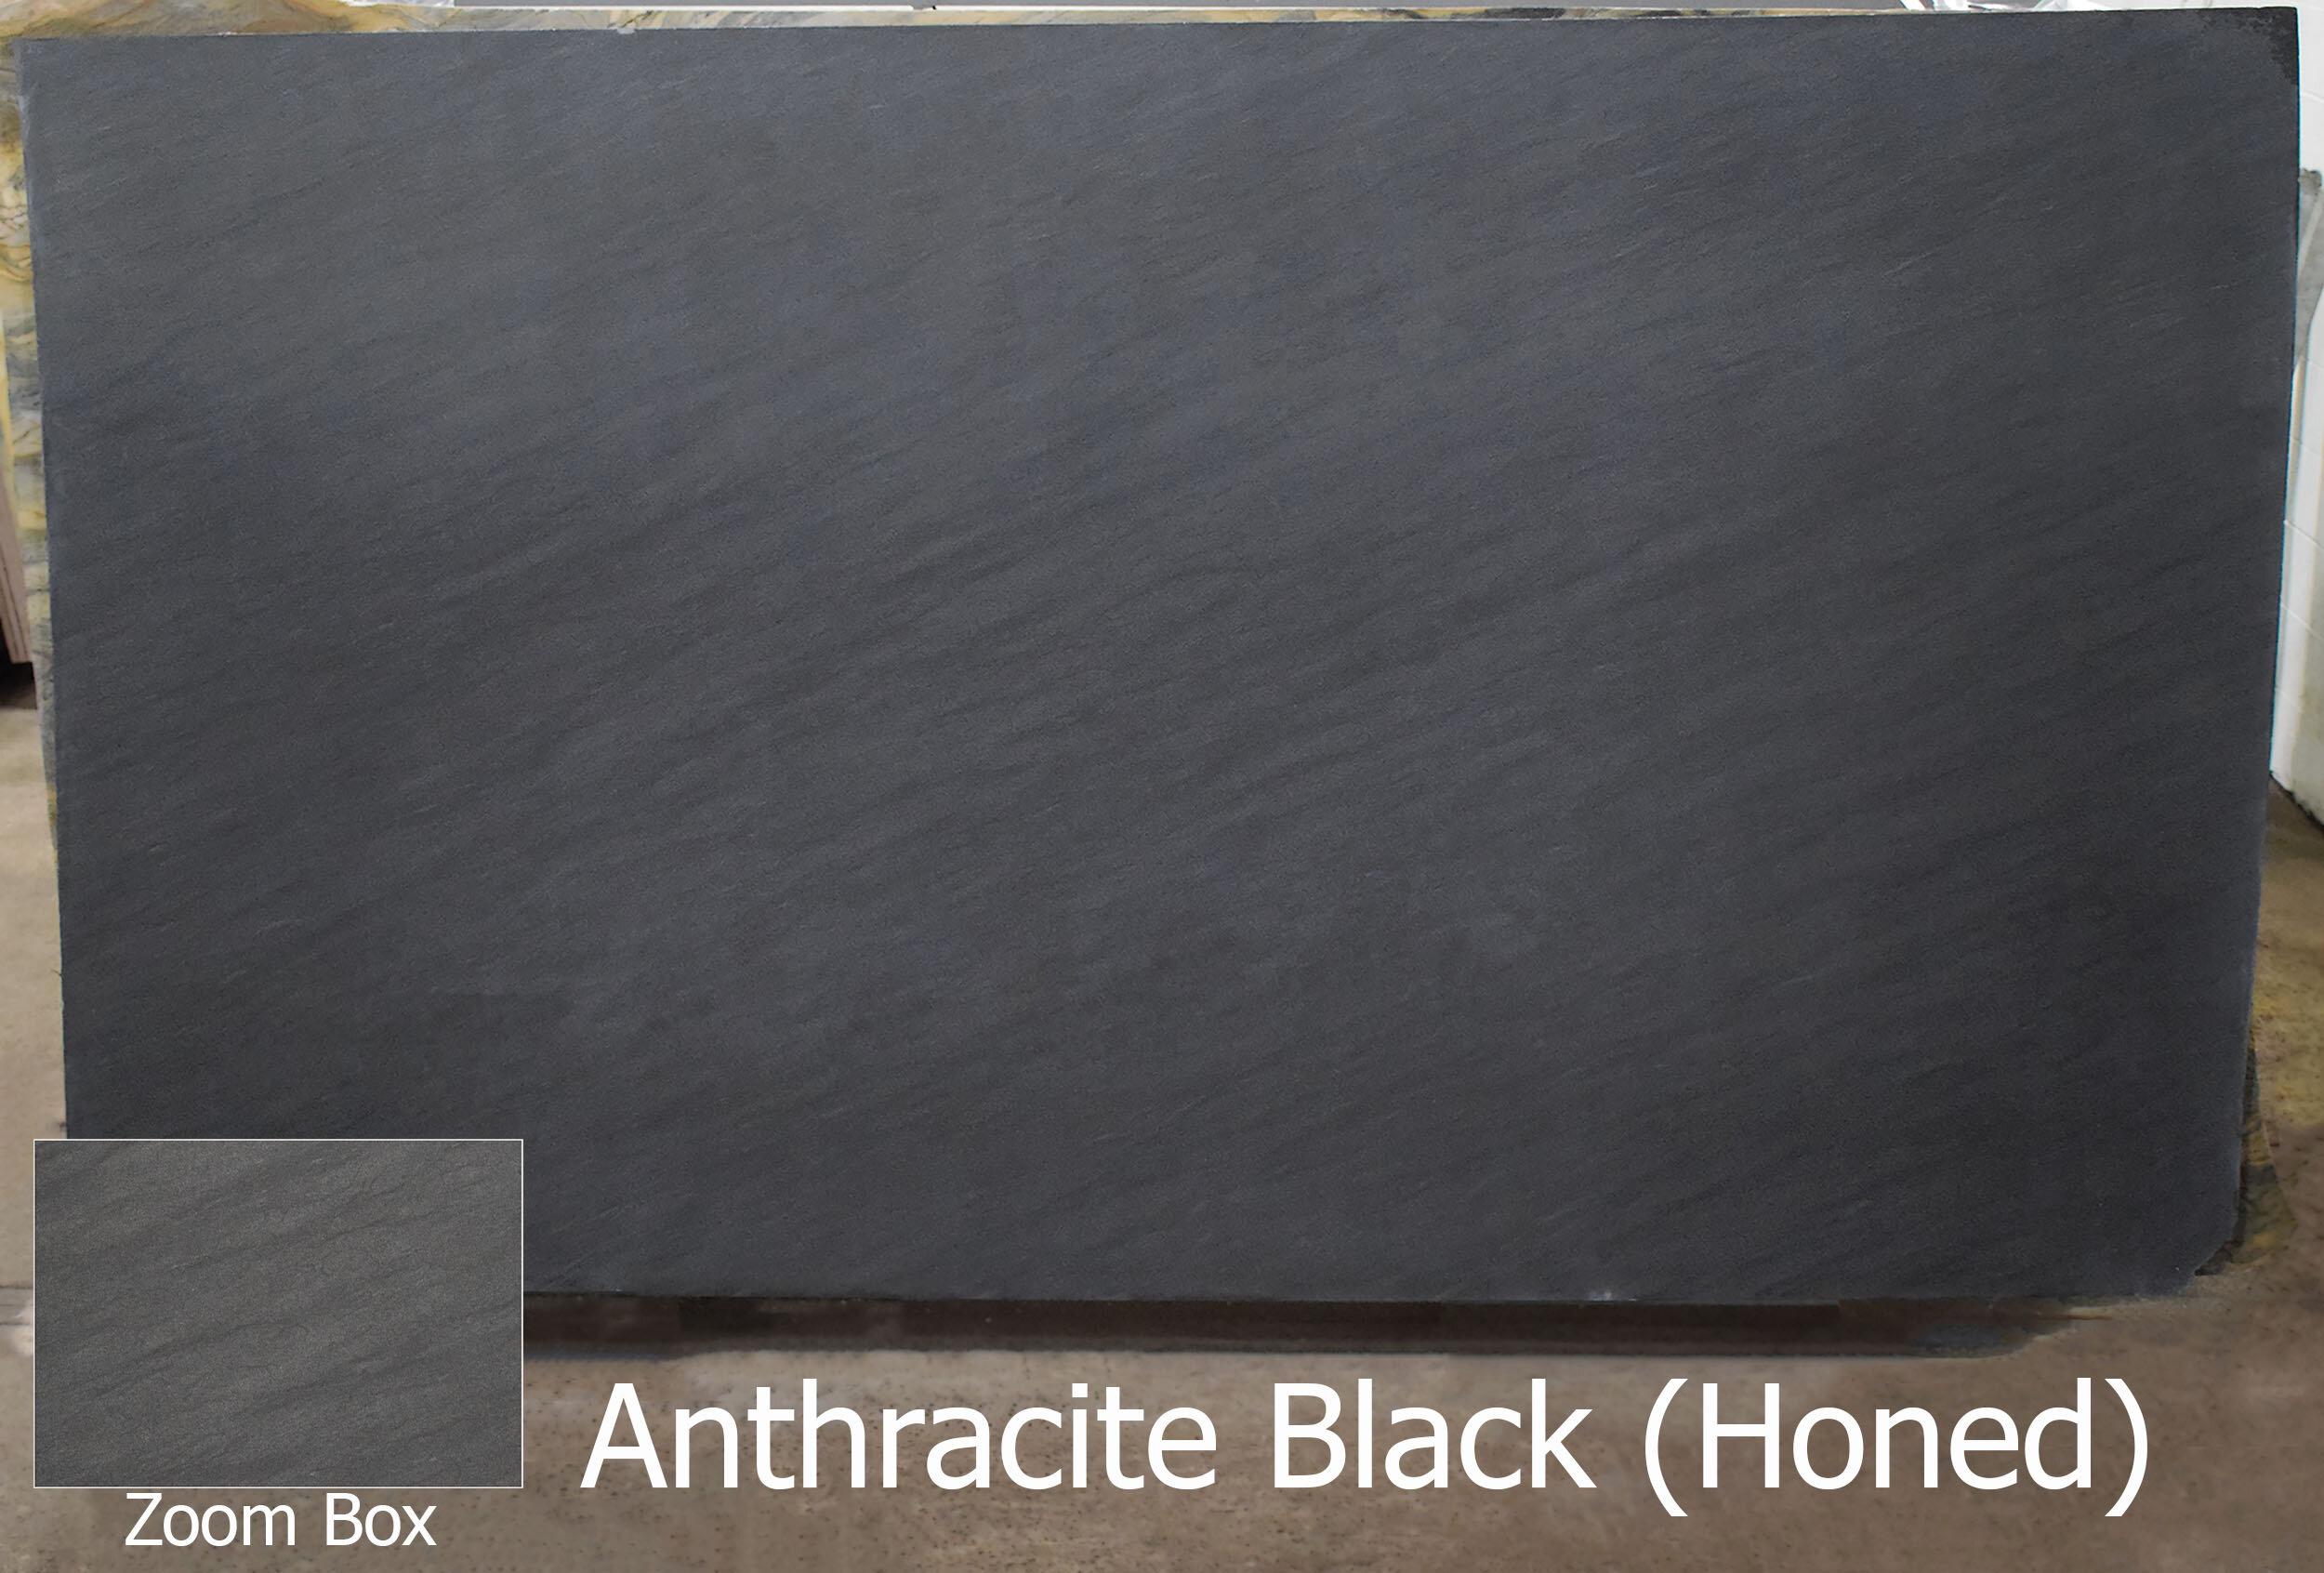 ANTHRACITE BLACK (HONED)